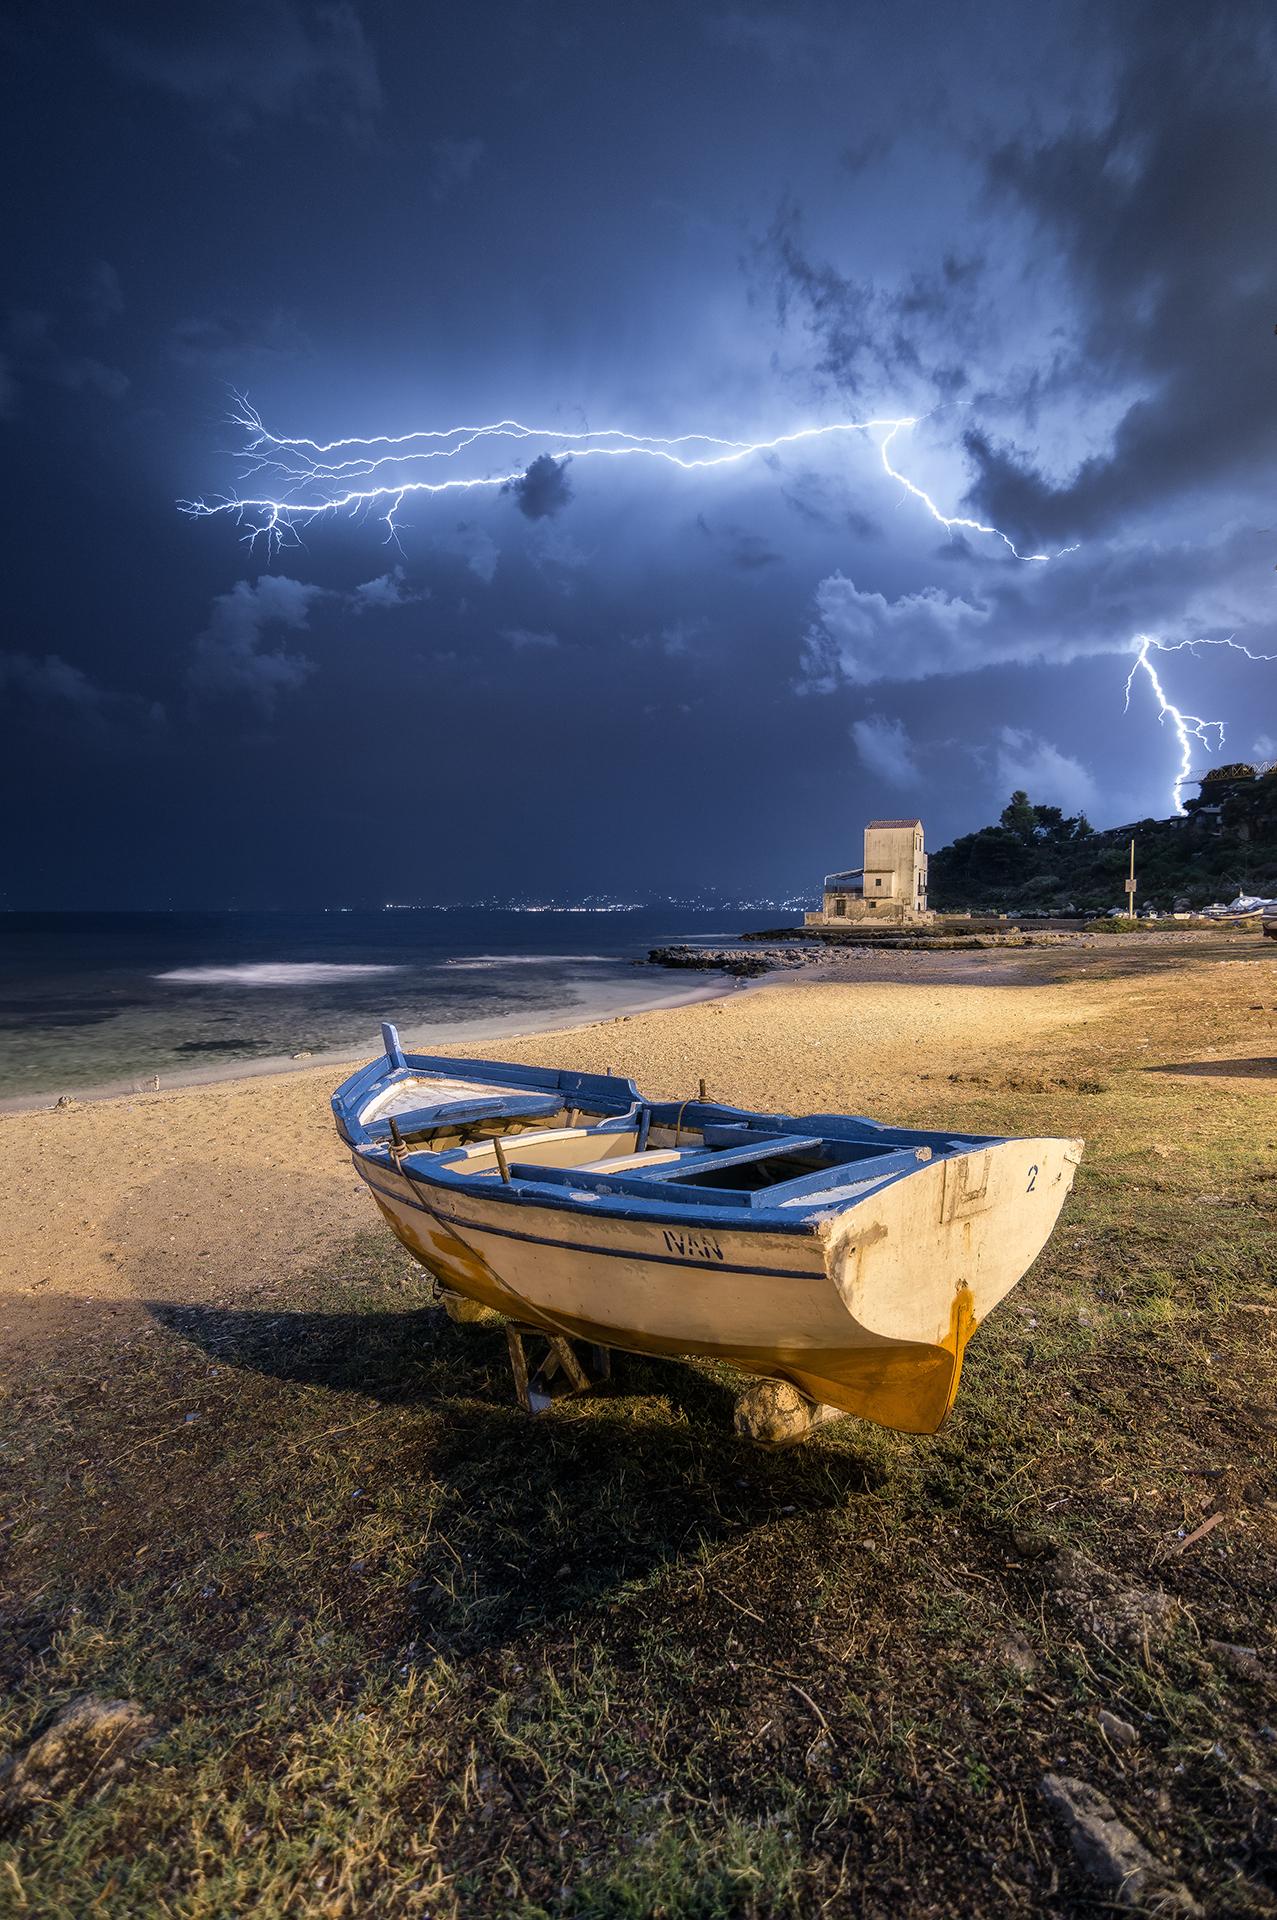 Stormy night.......